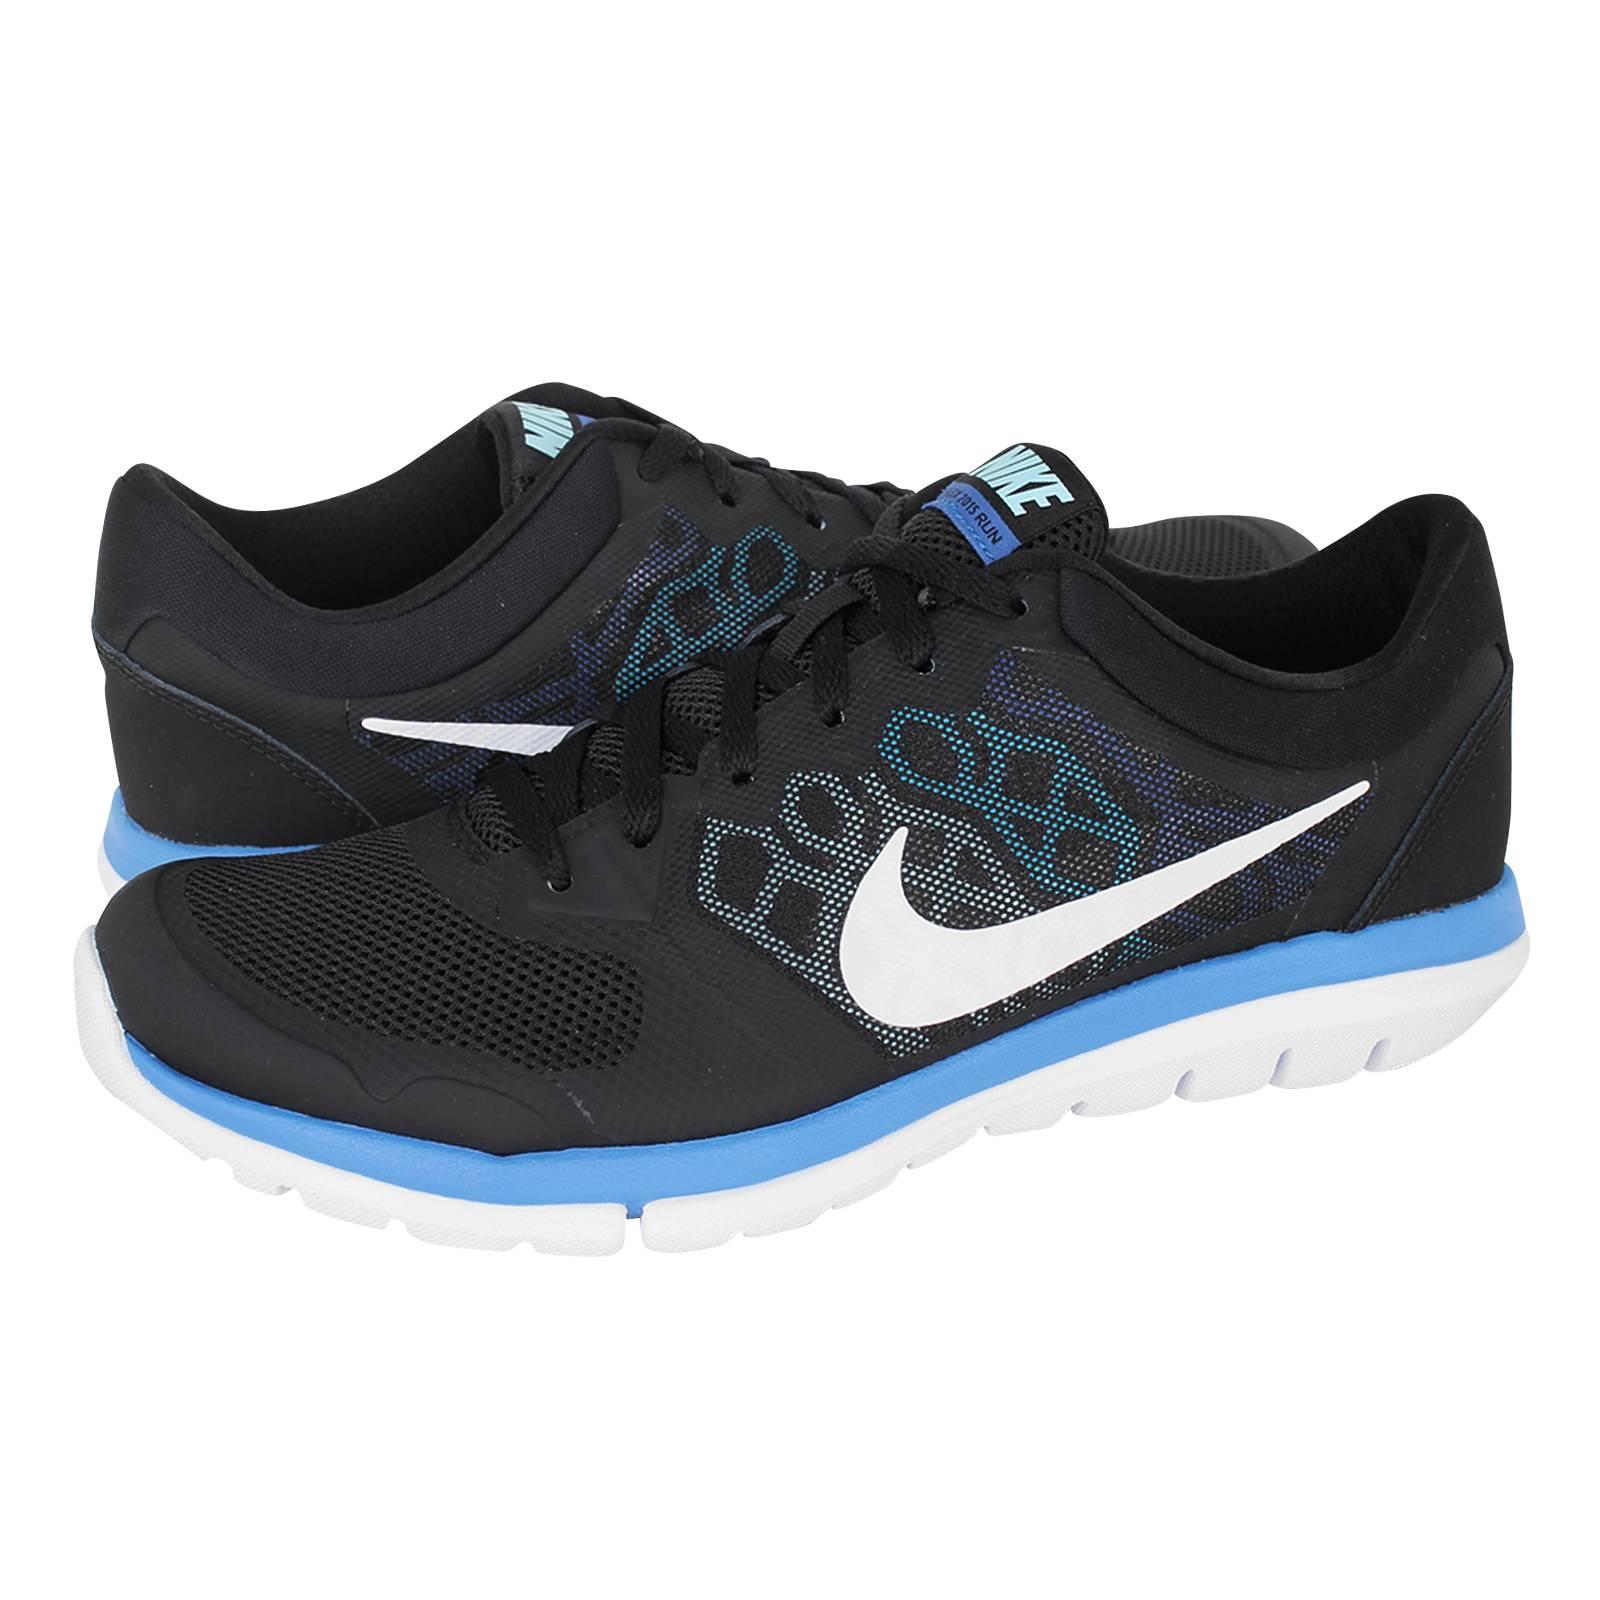 Flex 2015 RN - Nike Men's athletic